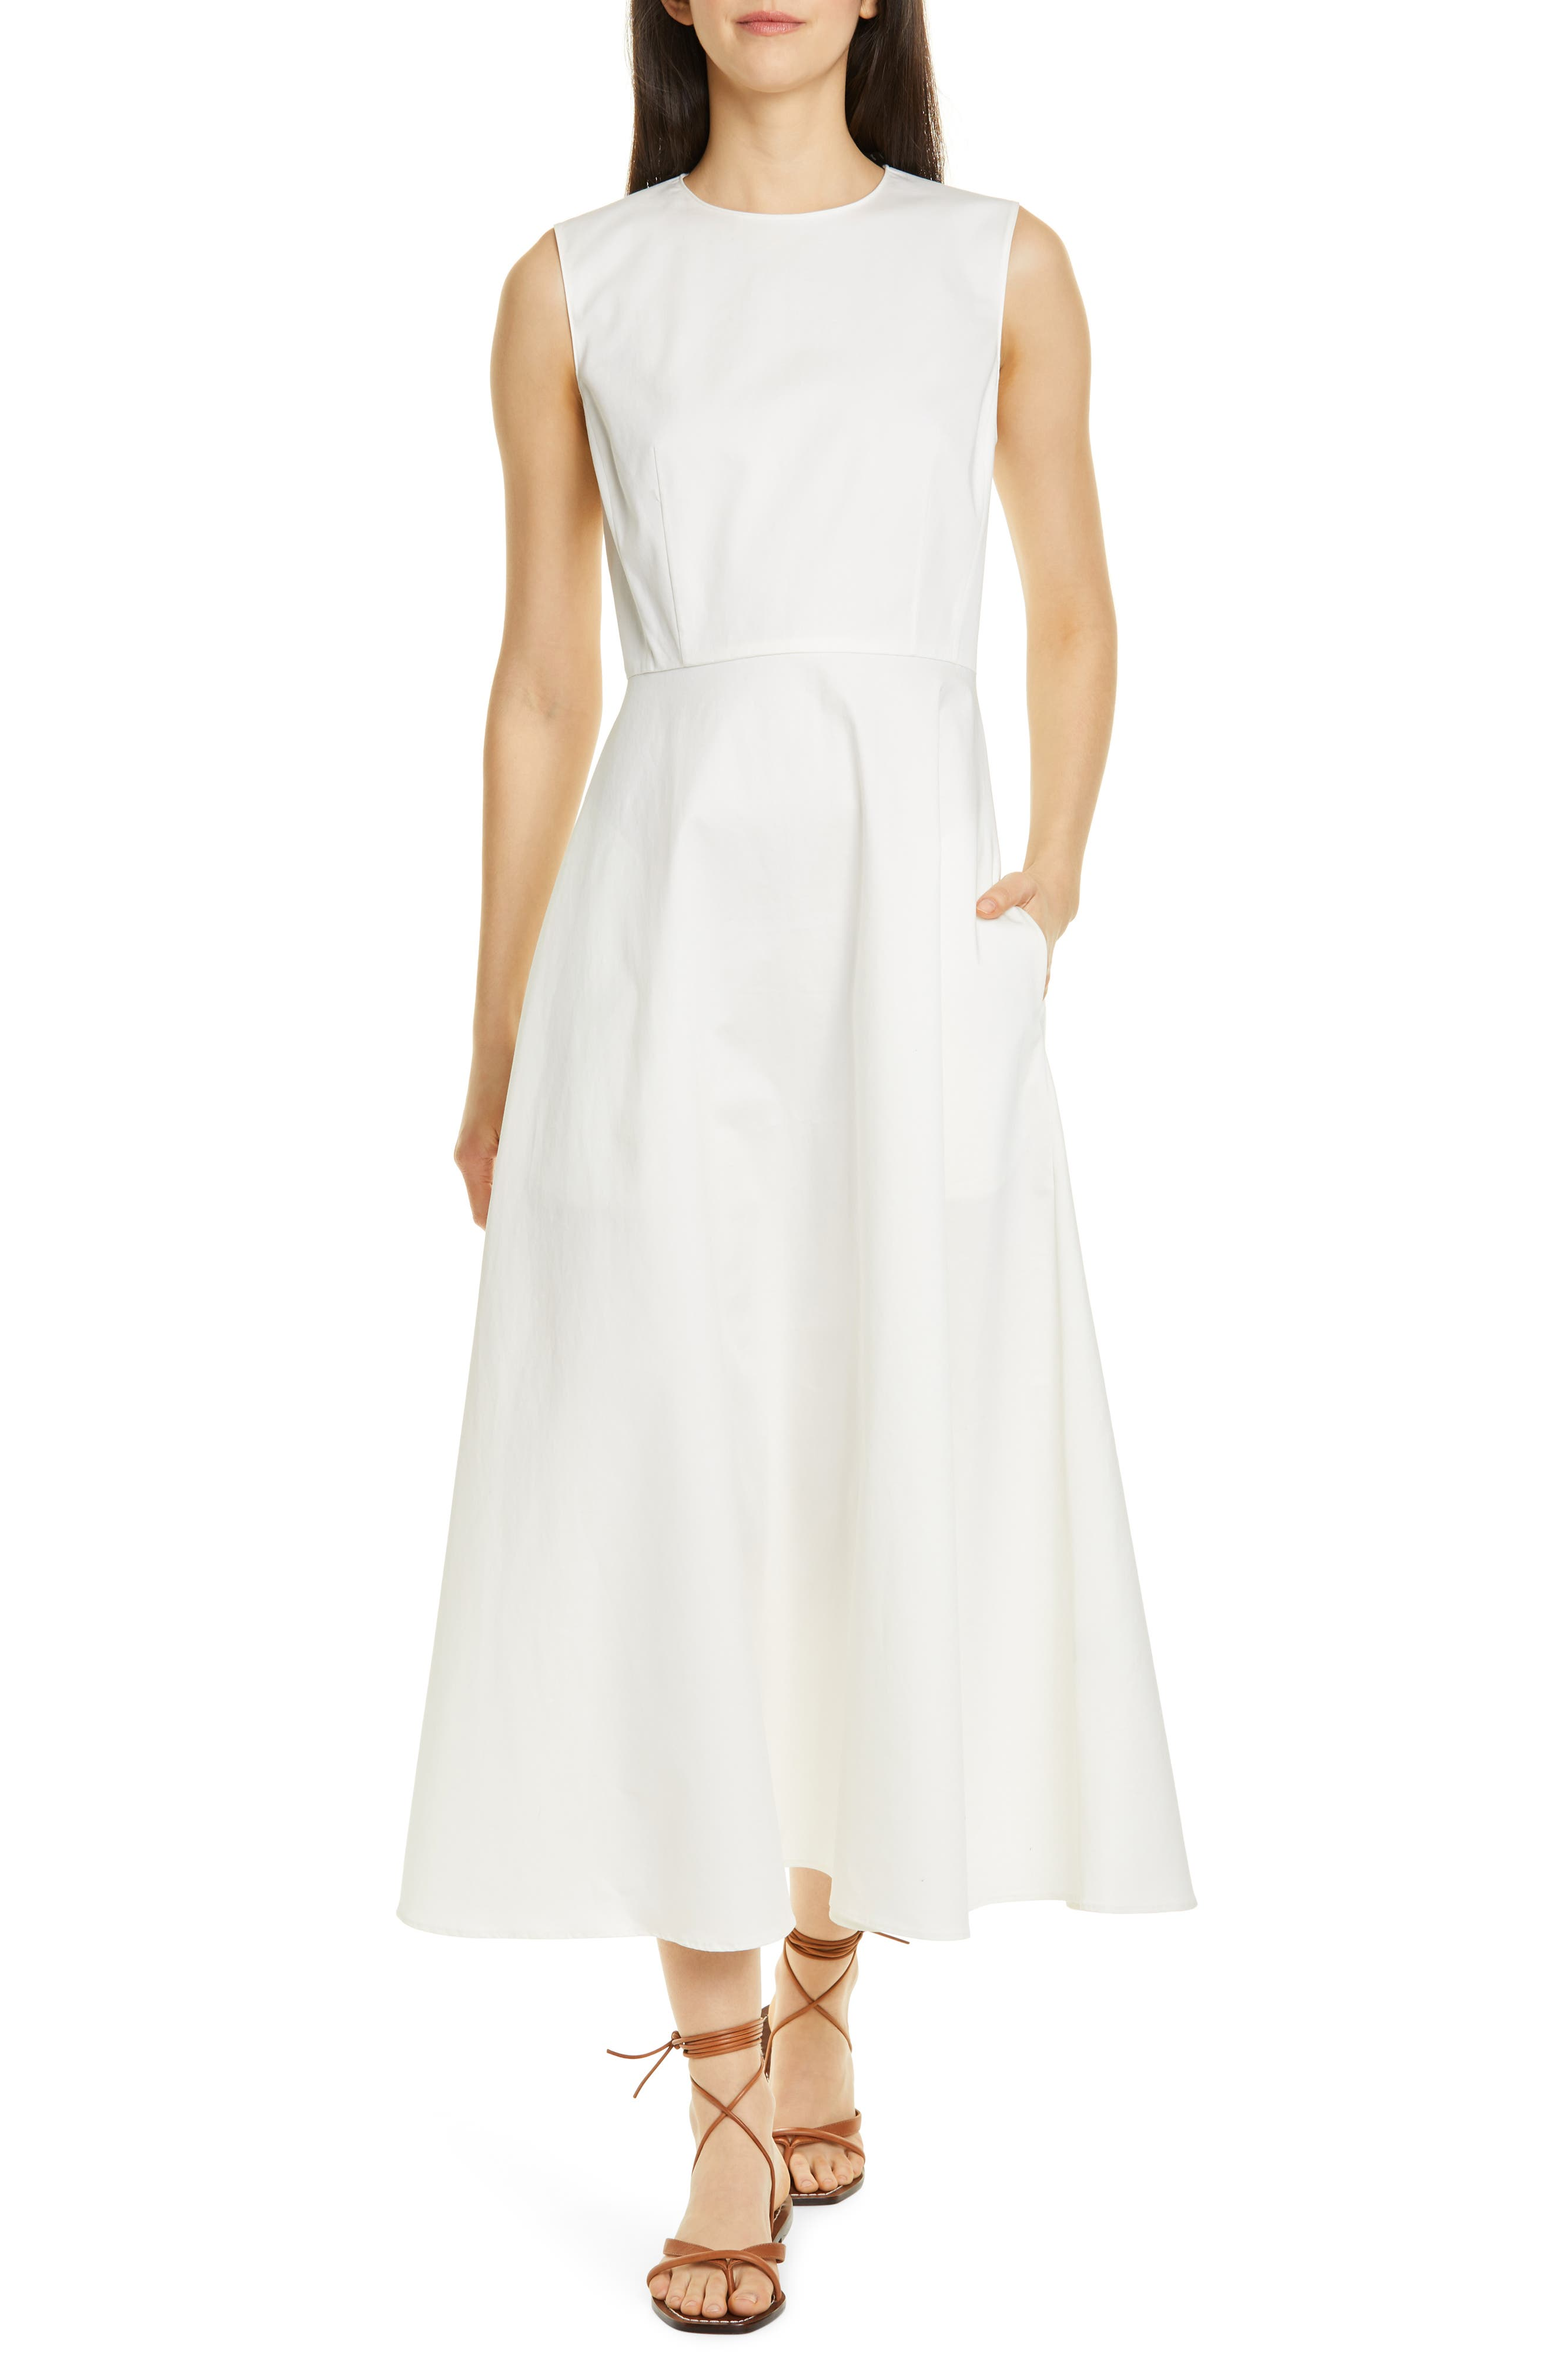 Theory Sleeveless Stretch Cotton Dress, White